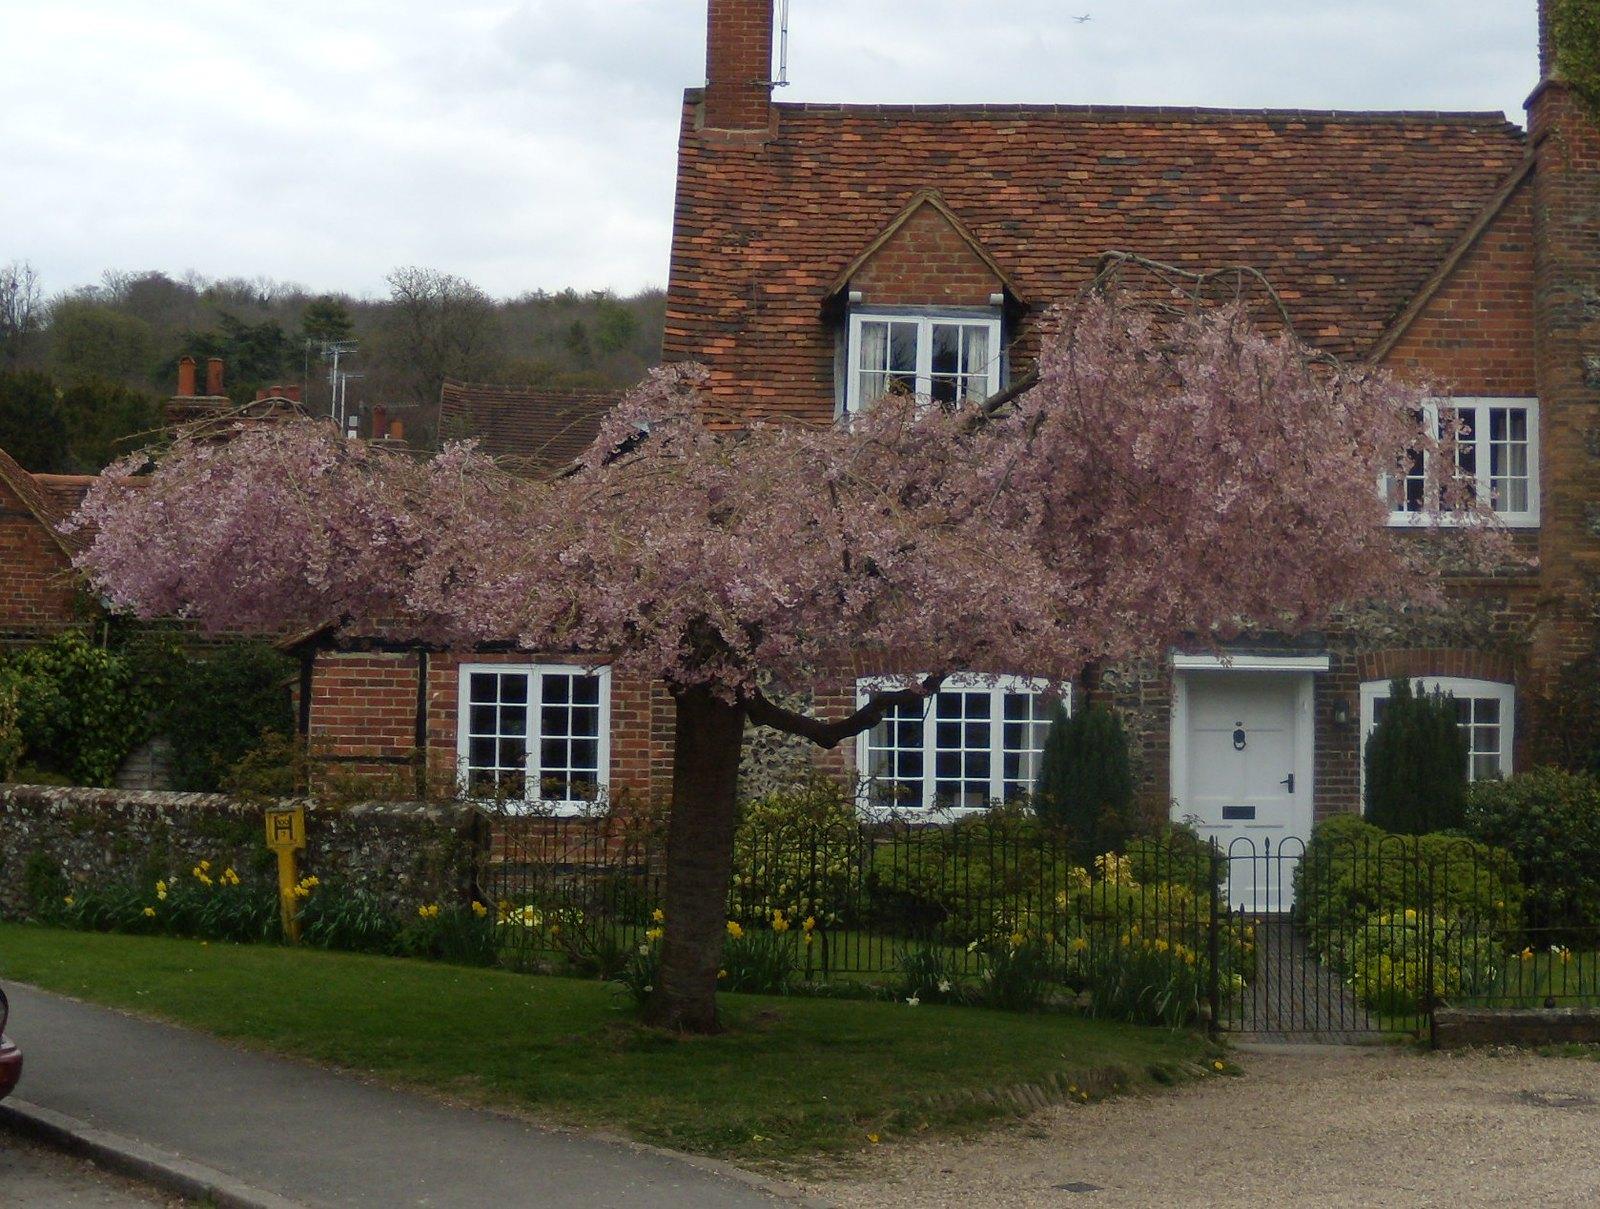 Cherry tree Hambleden. Marlow Circular